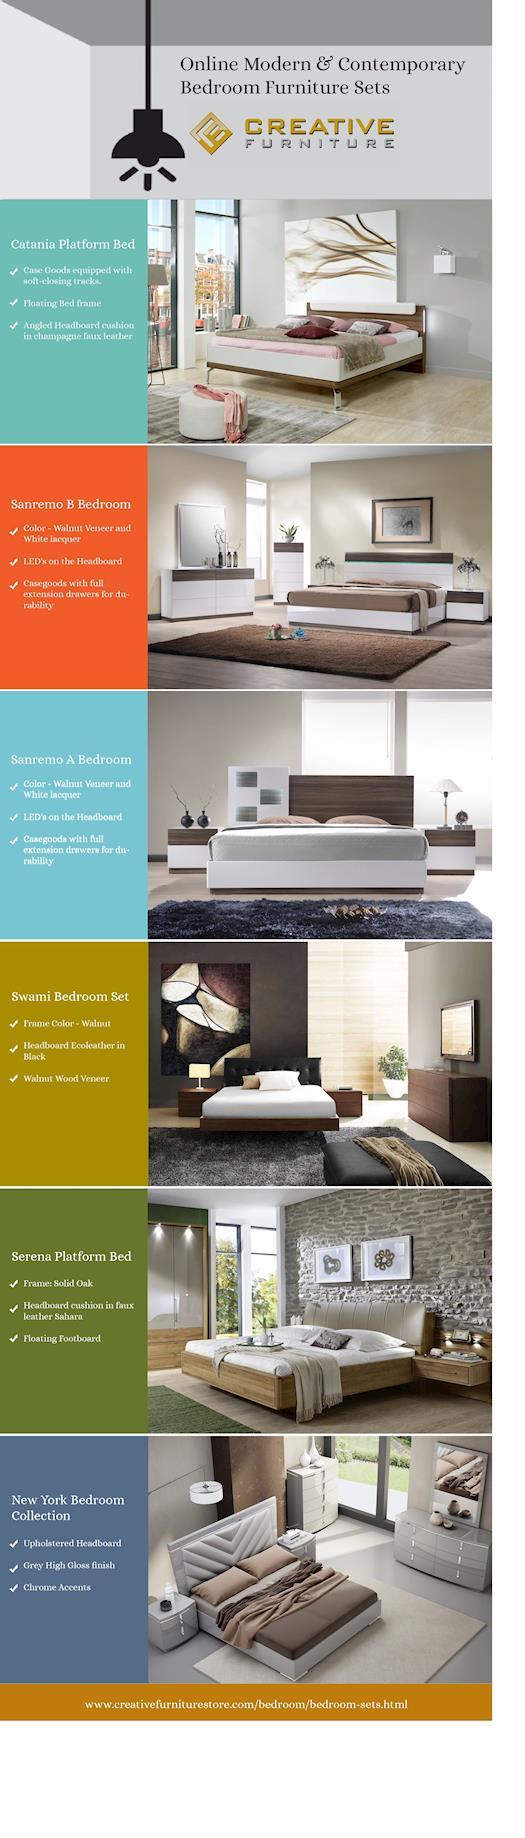 Online Modern & Contemporary Bedroom Furniture Sets